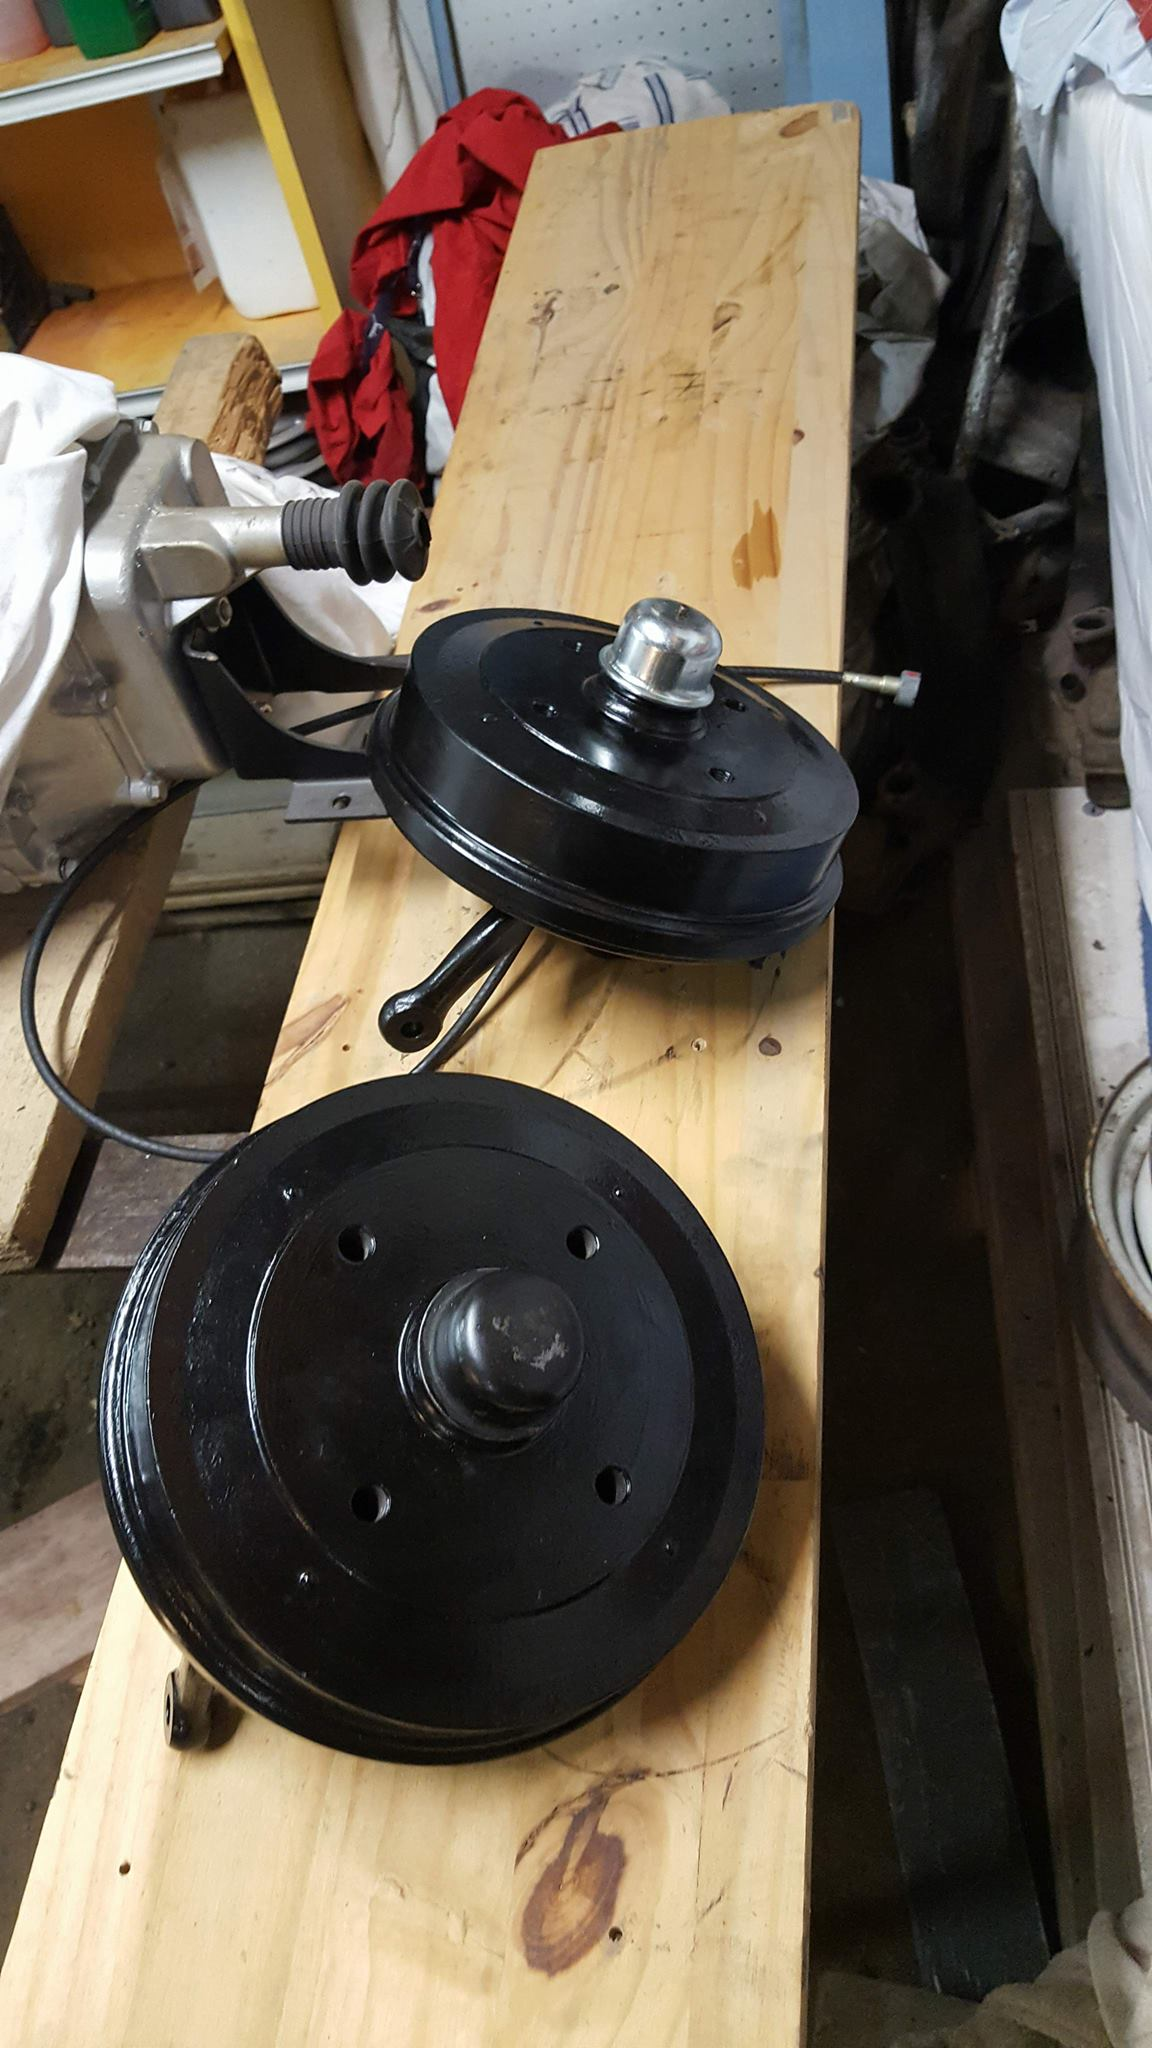 projet remontage buggy super GP 74  81416322345549101552564827391391535113549o